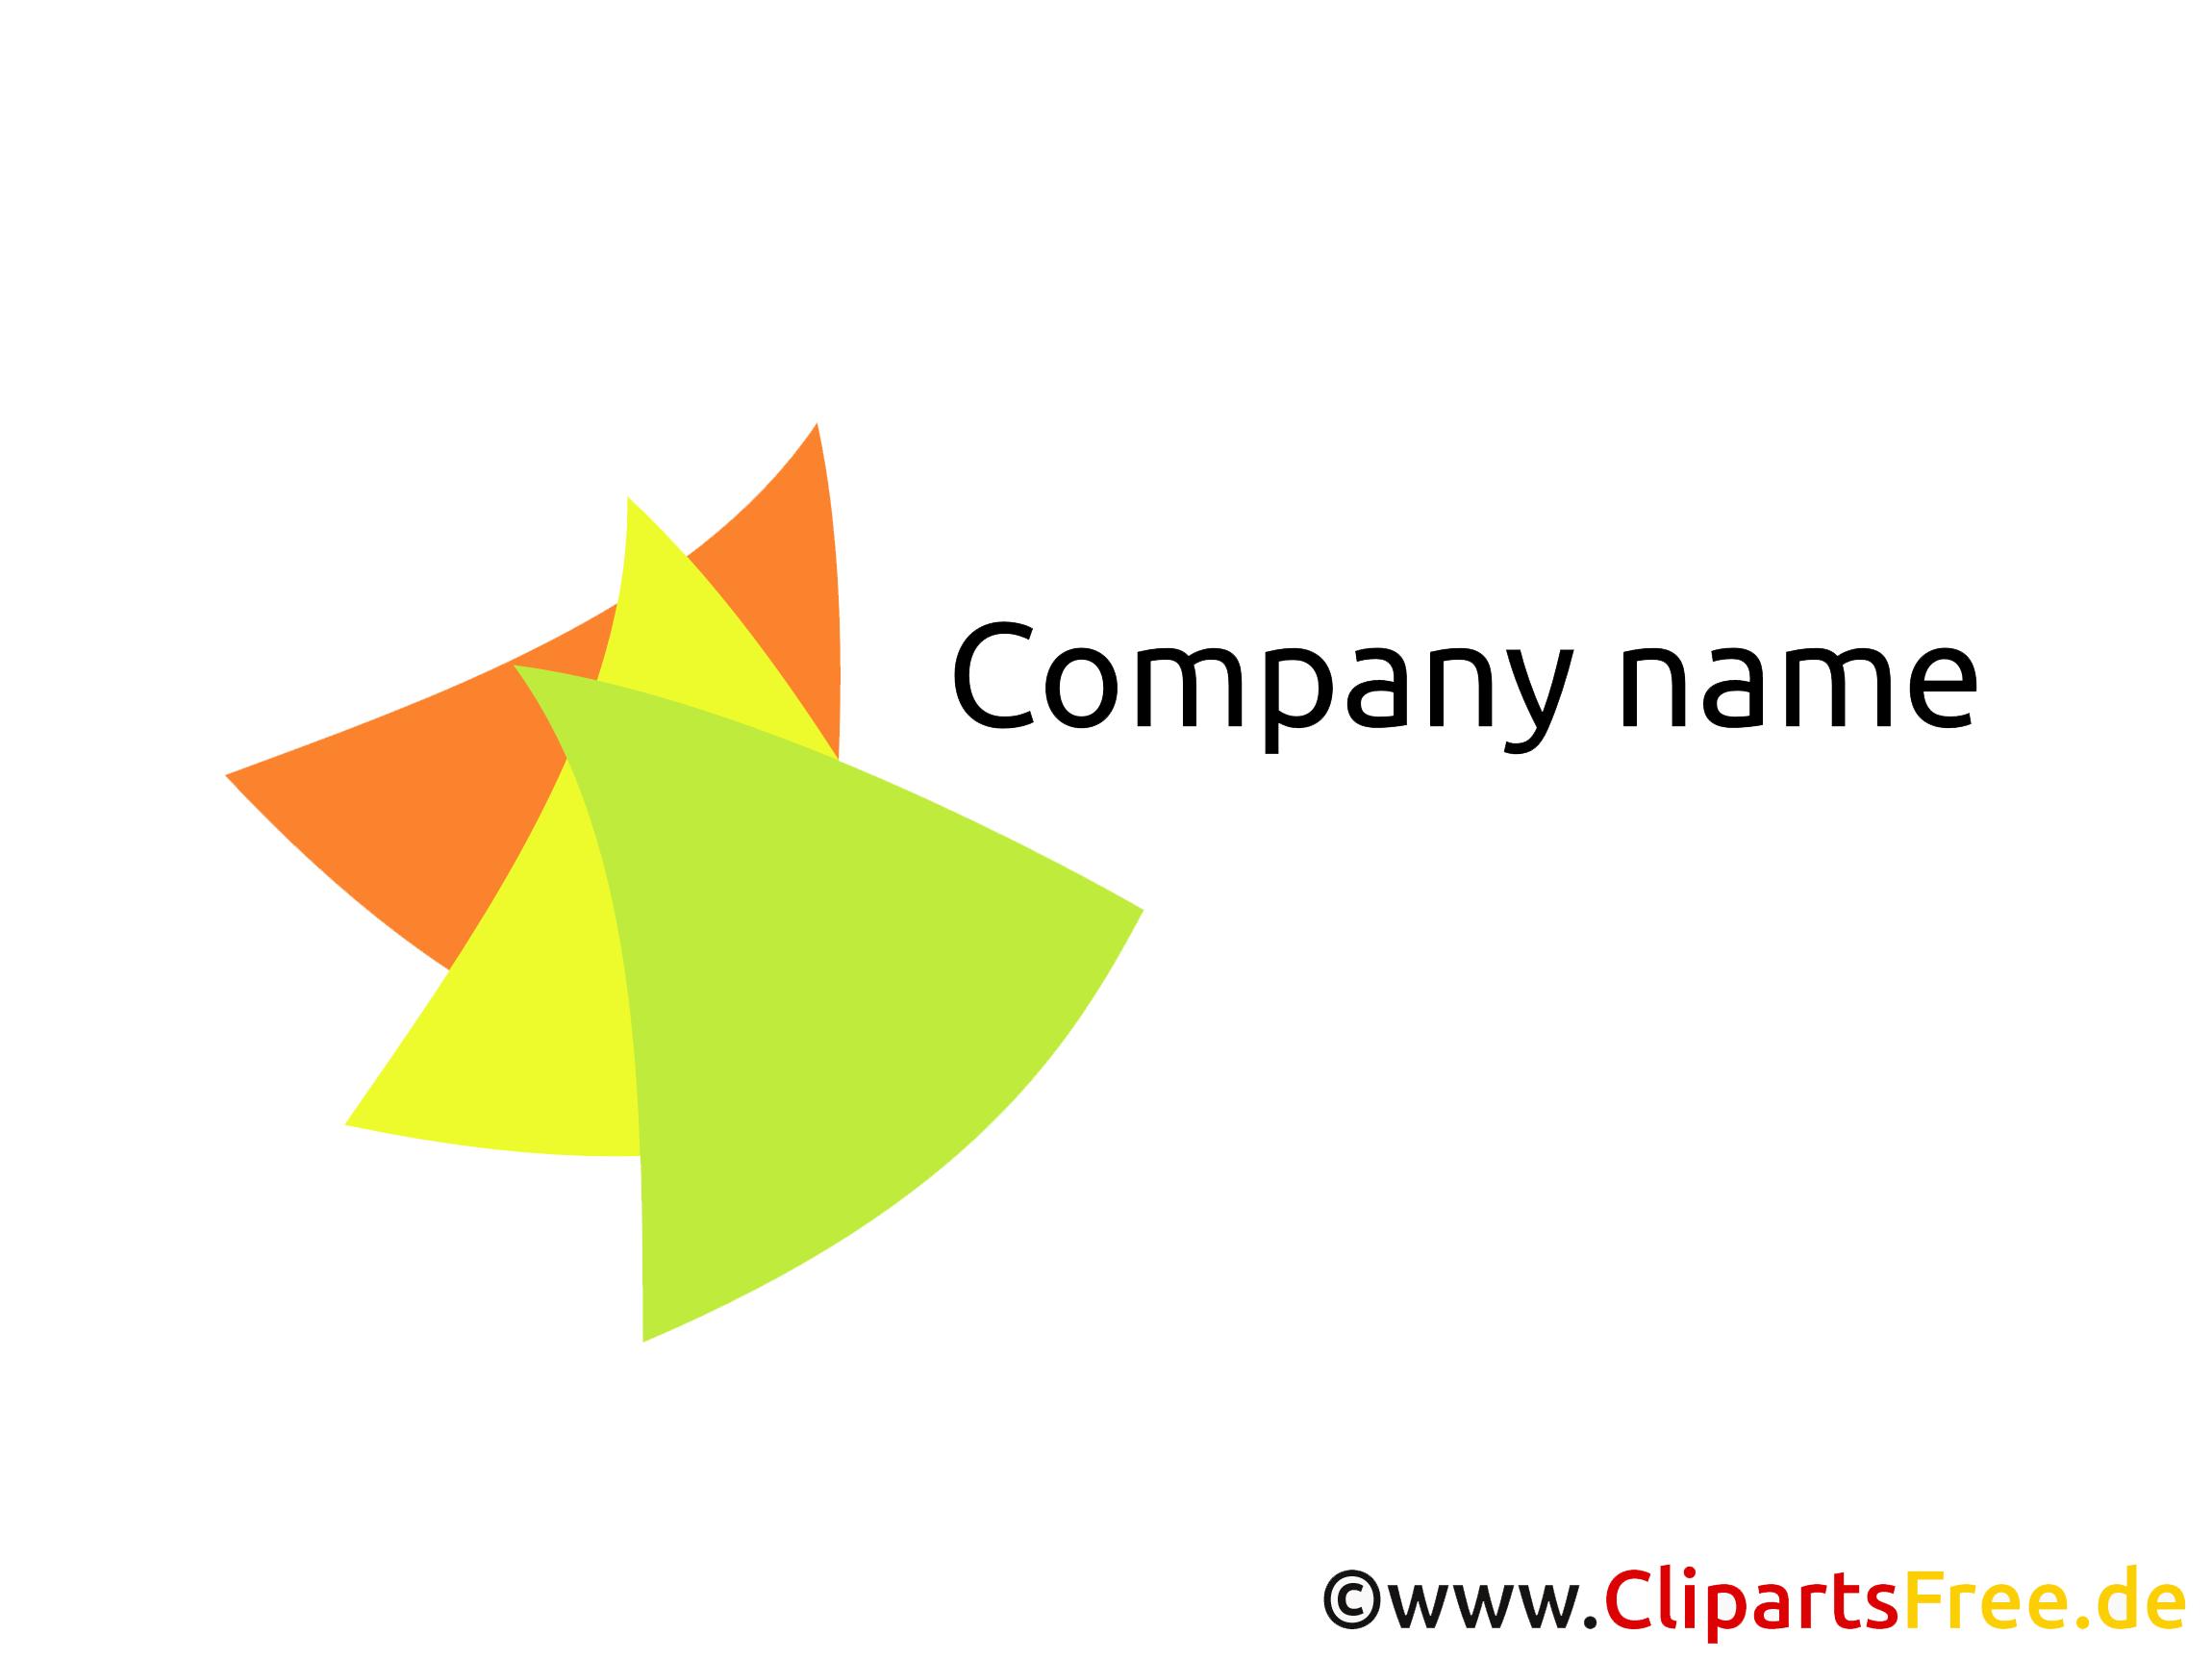 Enseigne image gratuite – Logo cliparts